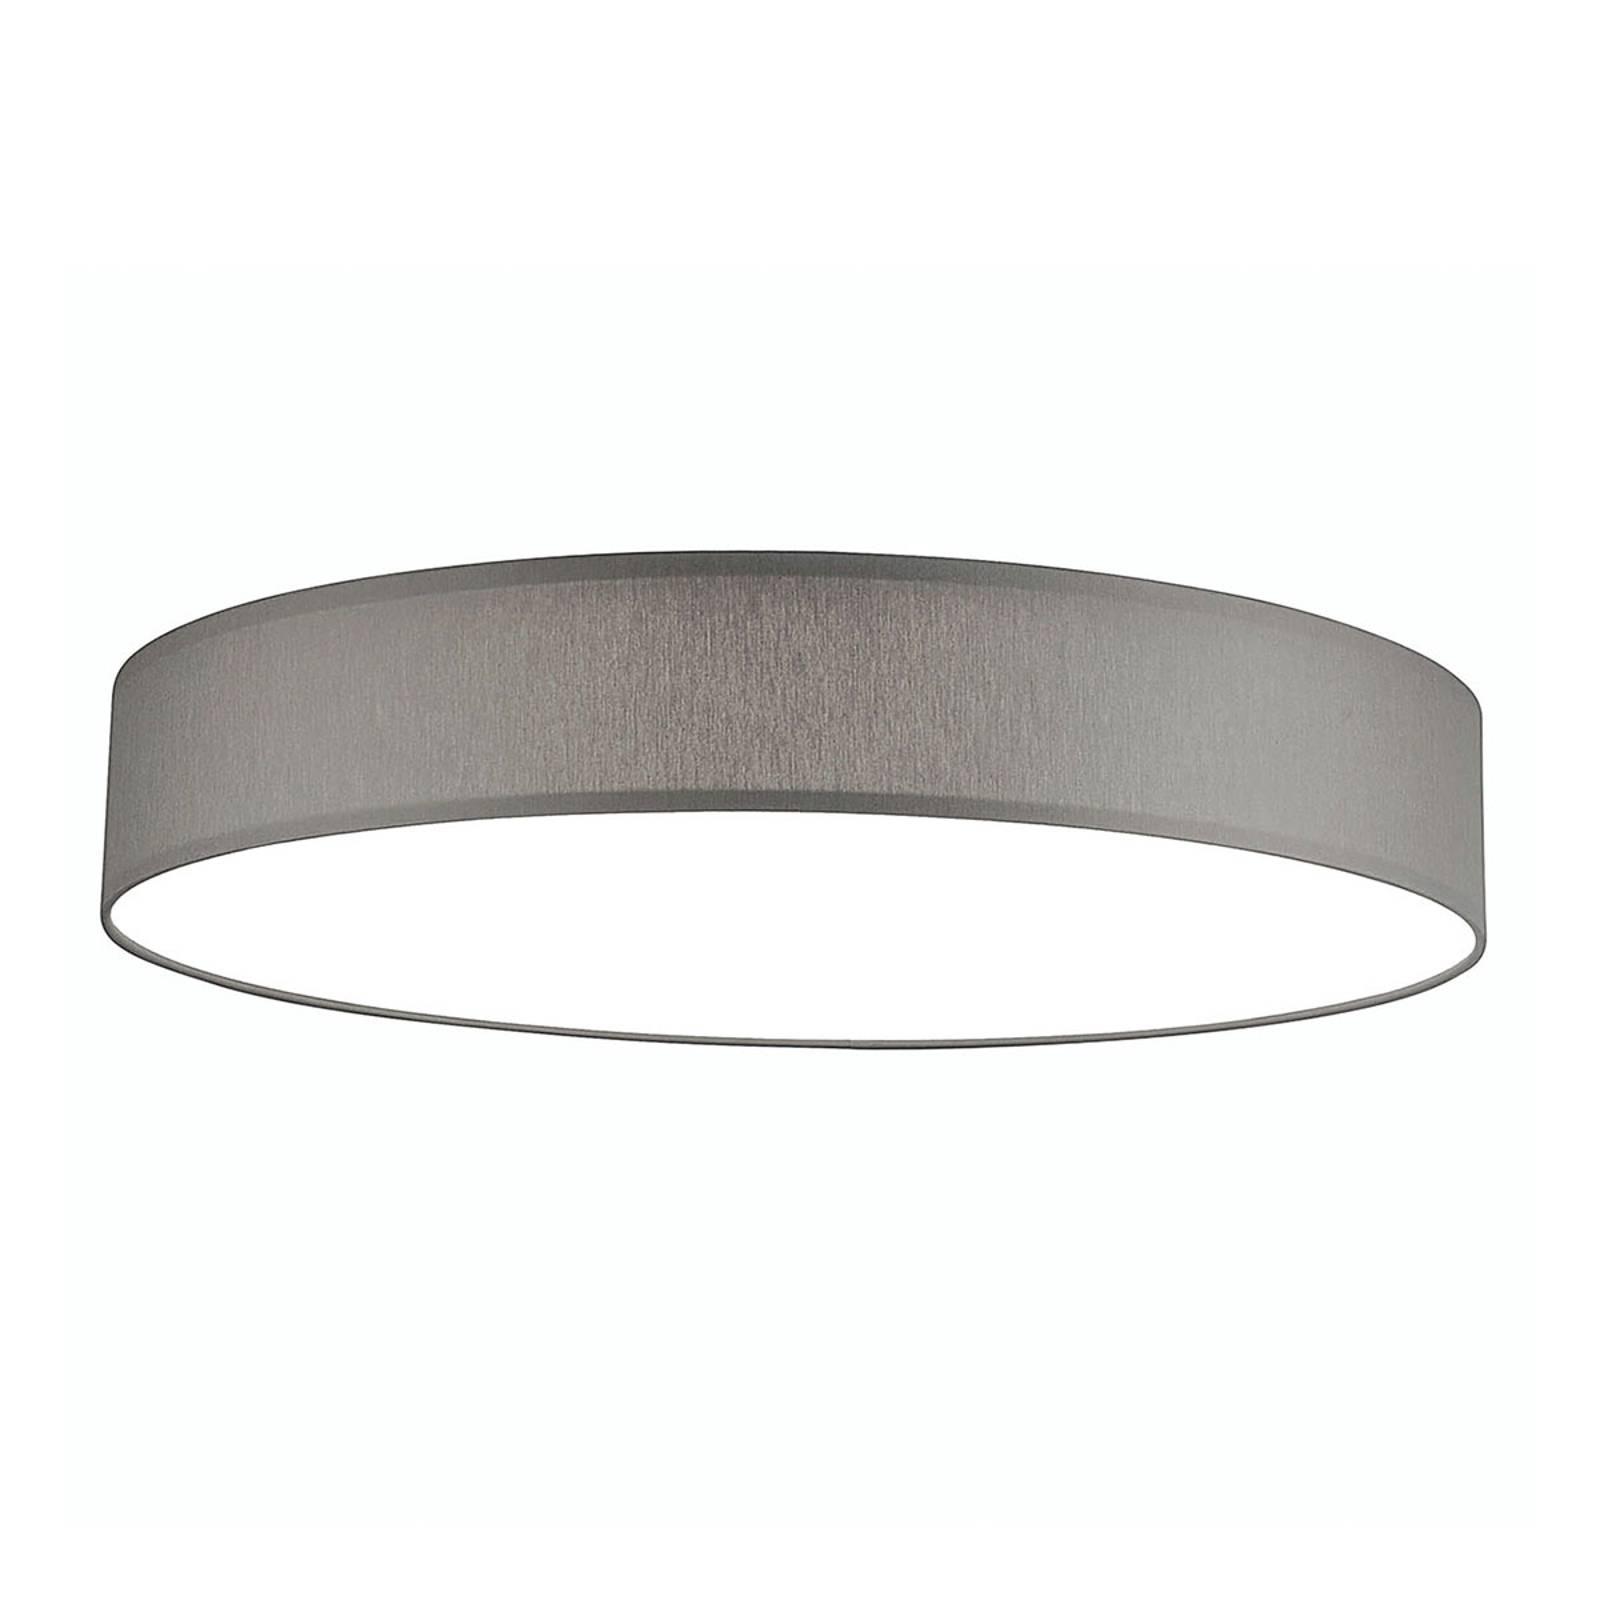 LED-kattovalaisin Luno XL 3 000 K 60 W harmaa